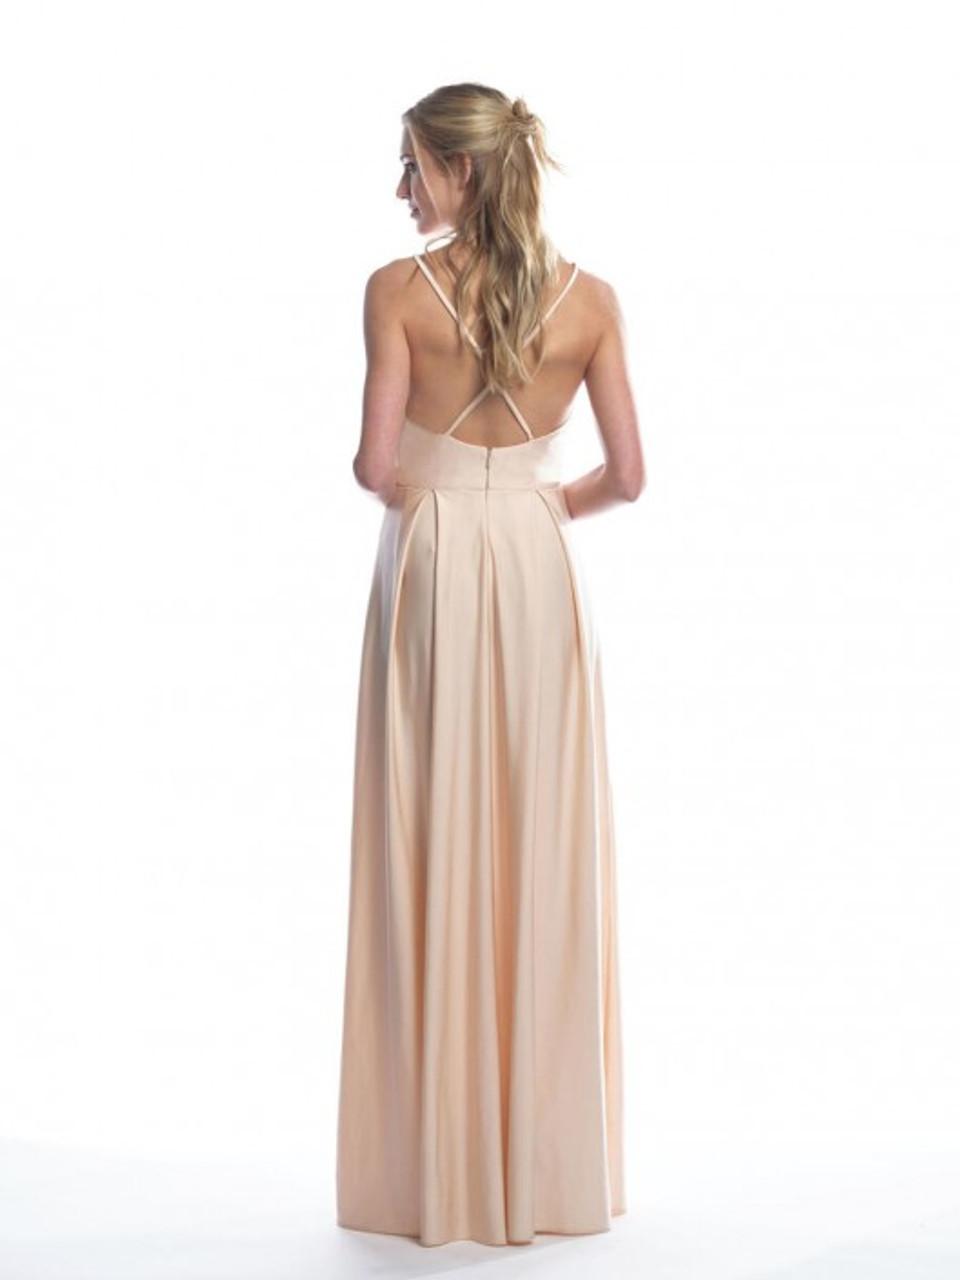 Bari Jay 2061 Slide Slit Bridesmaid Dress - Lux Stretch